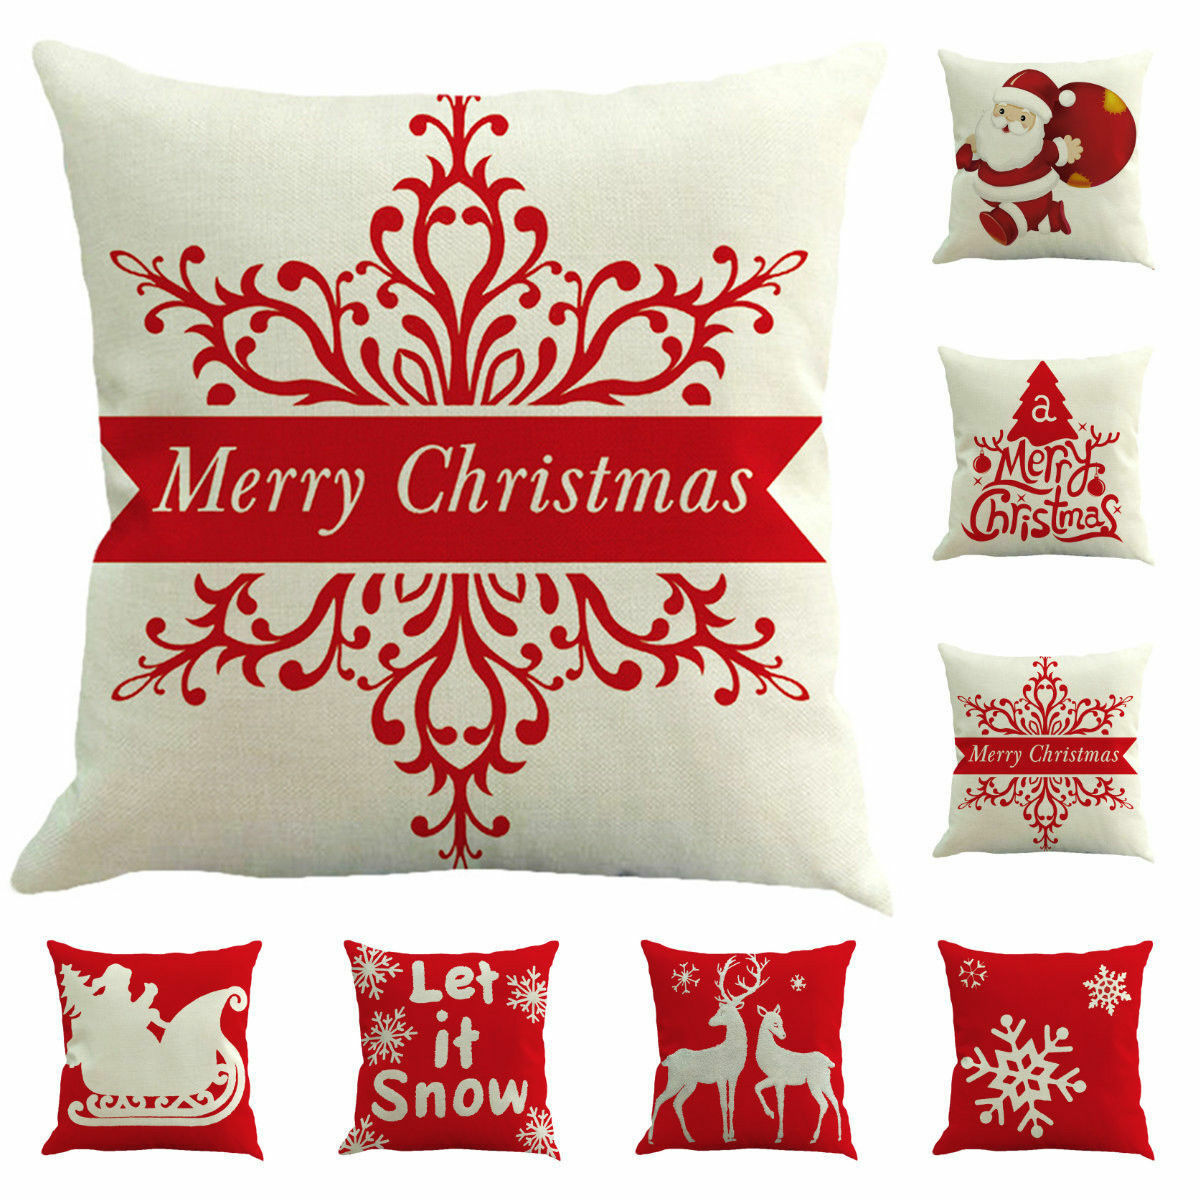 Christmas Xmas Soft Cushion Cover Throw Pillow Case Home Decor Festive Gift Red